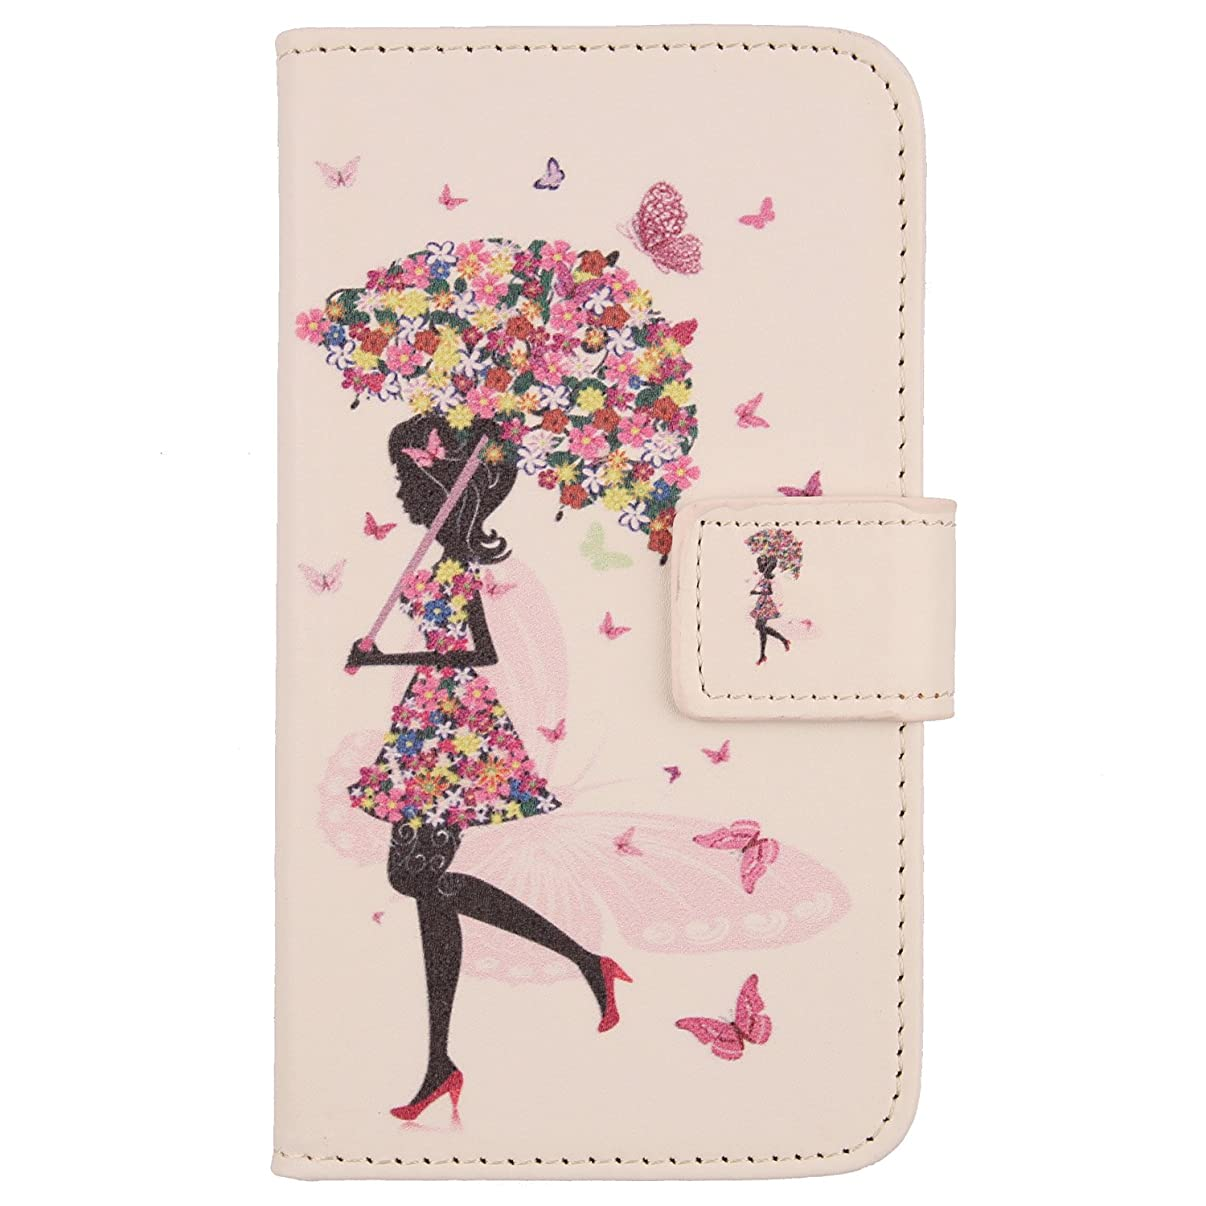 Lankashi Pattern Wallet Design Flip PU Leather Cover Skin Protection Case for Blu C5 2018 / C5L 5